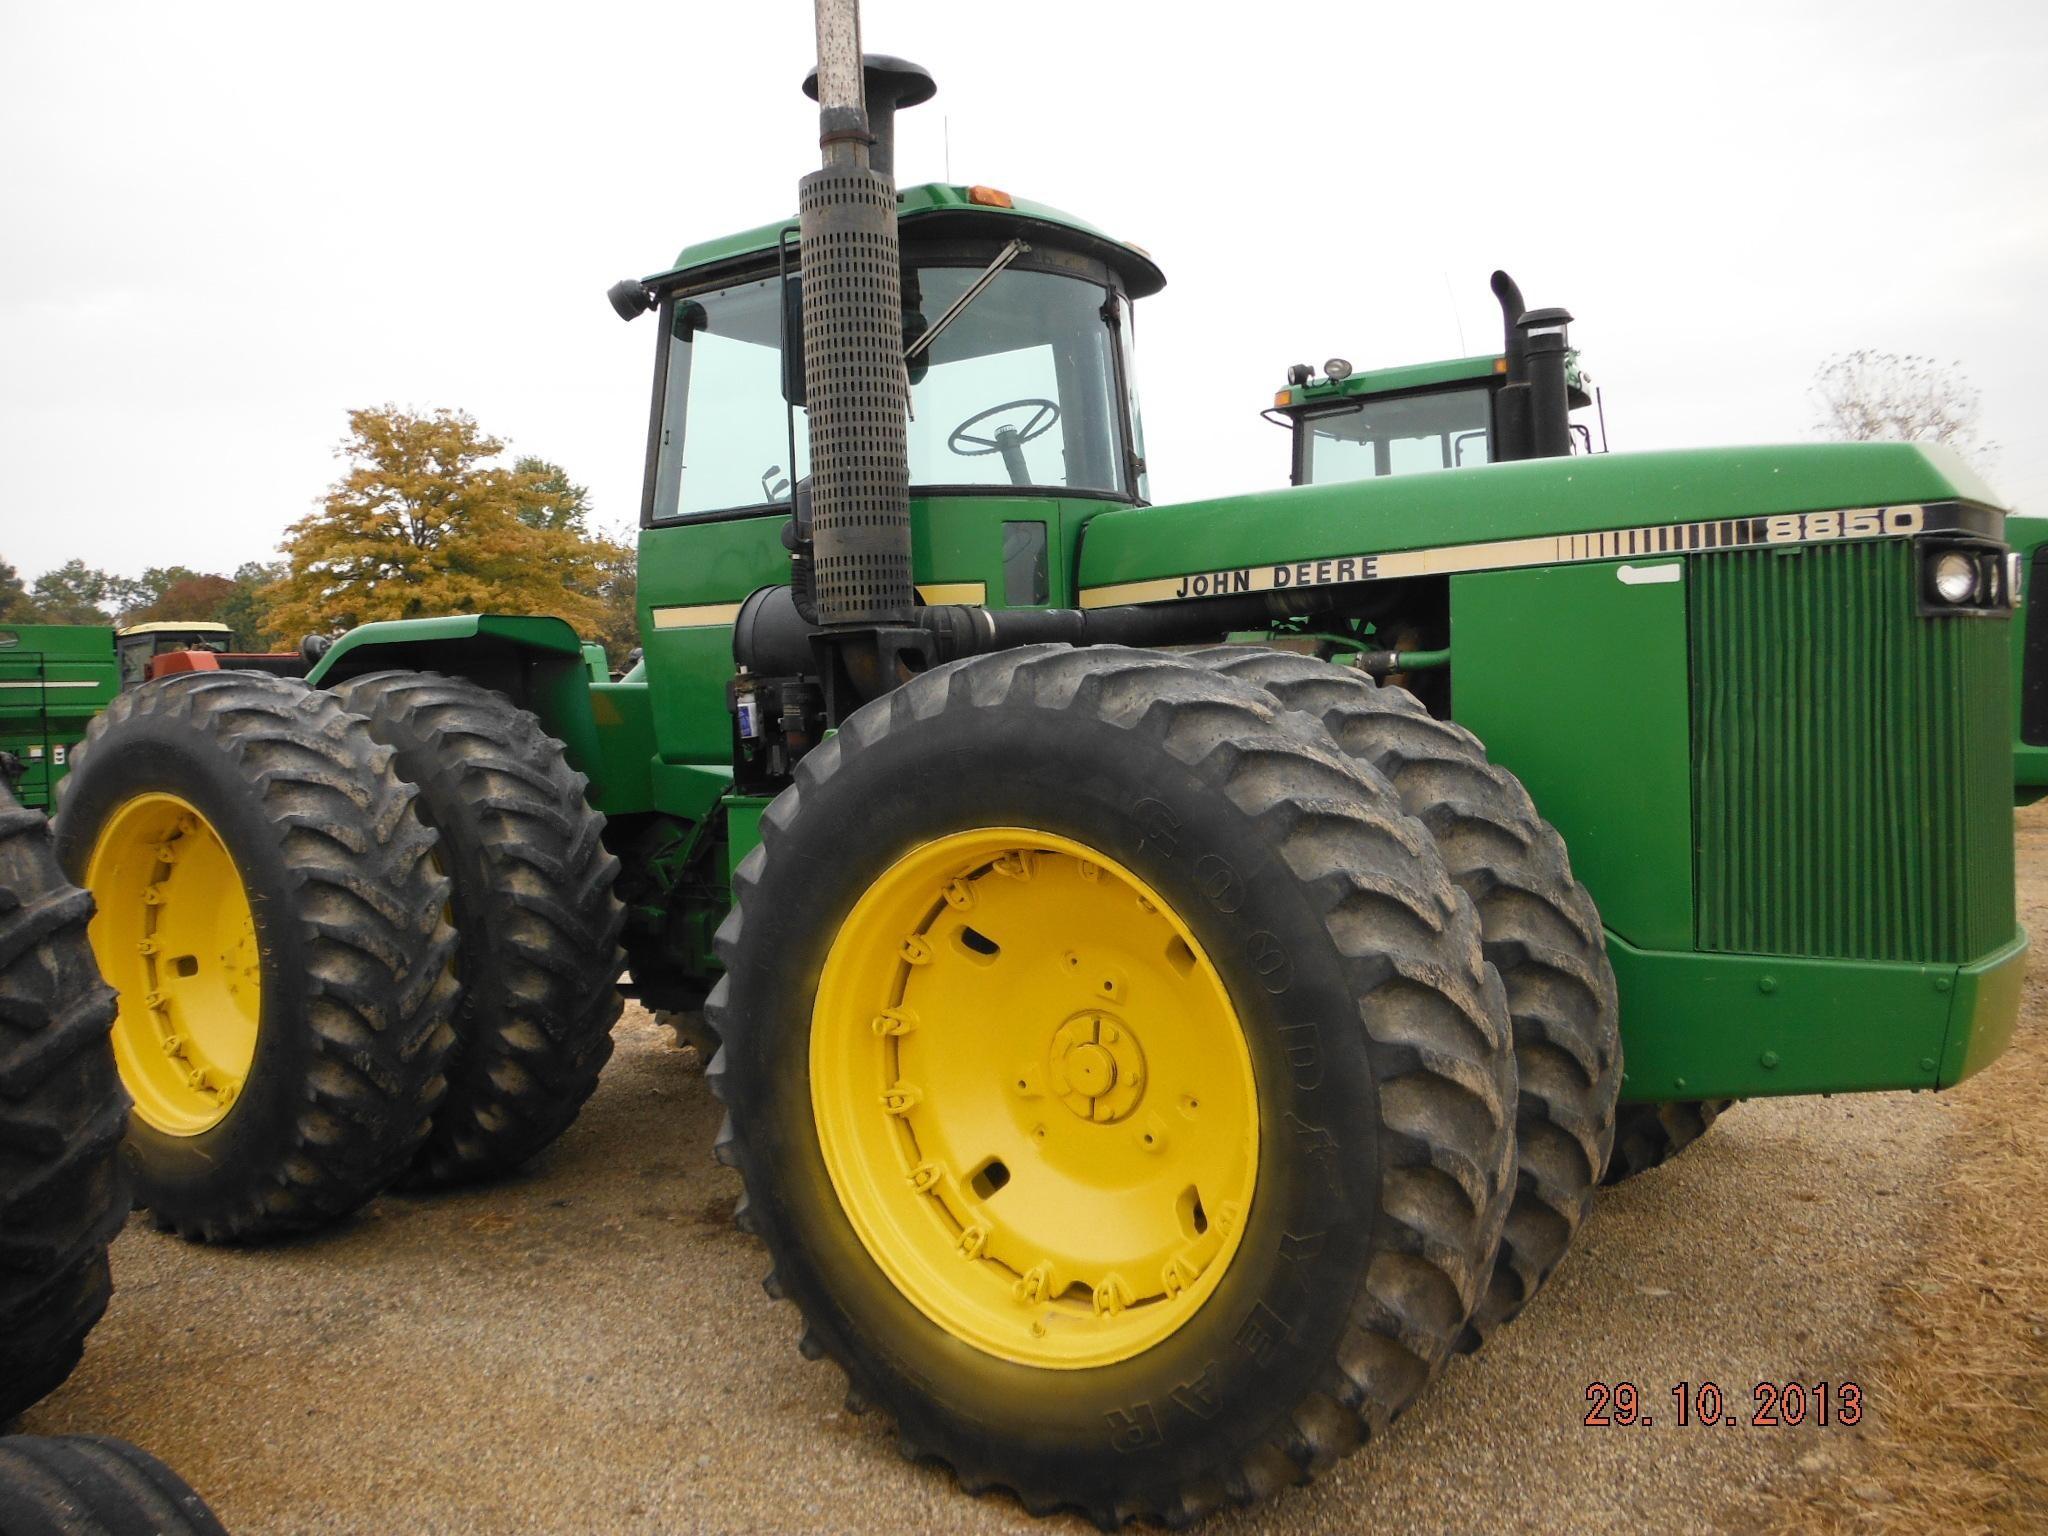 Wisconsin Ag Connection - JOHN DEERE 8850 Tractors for sale